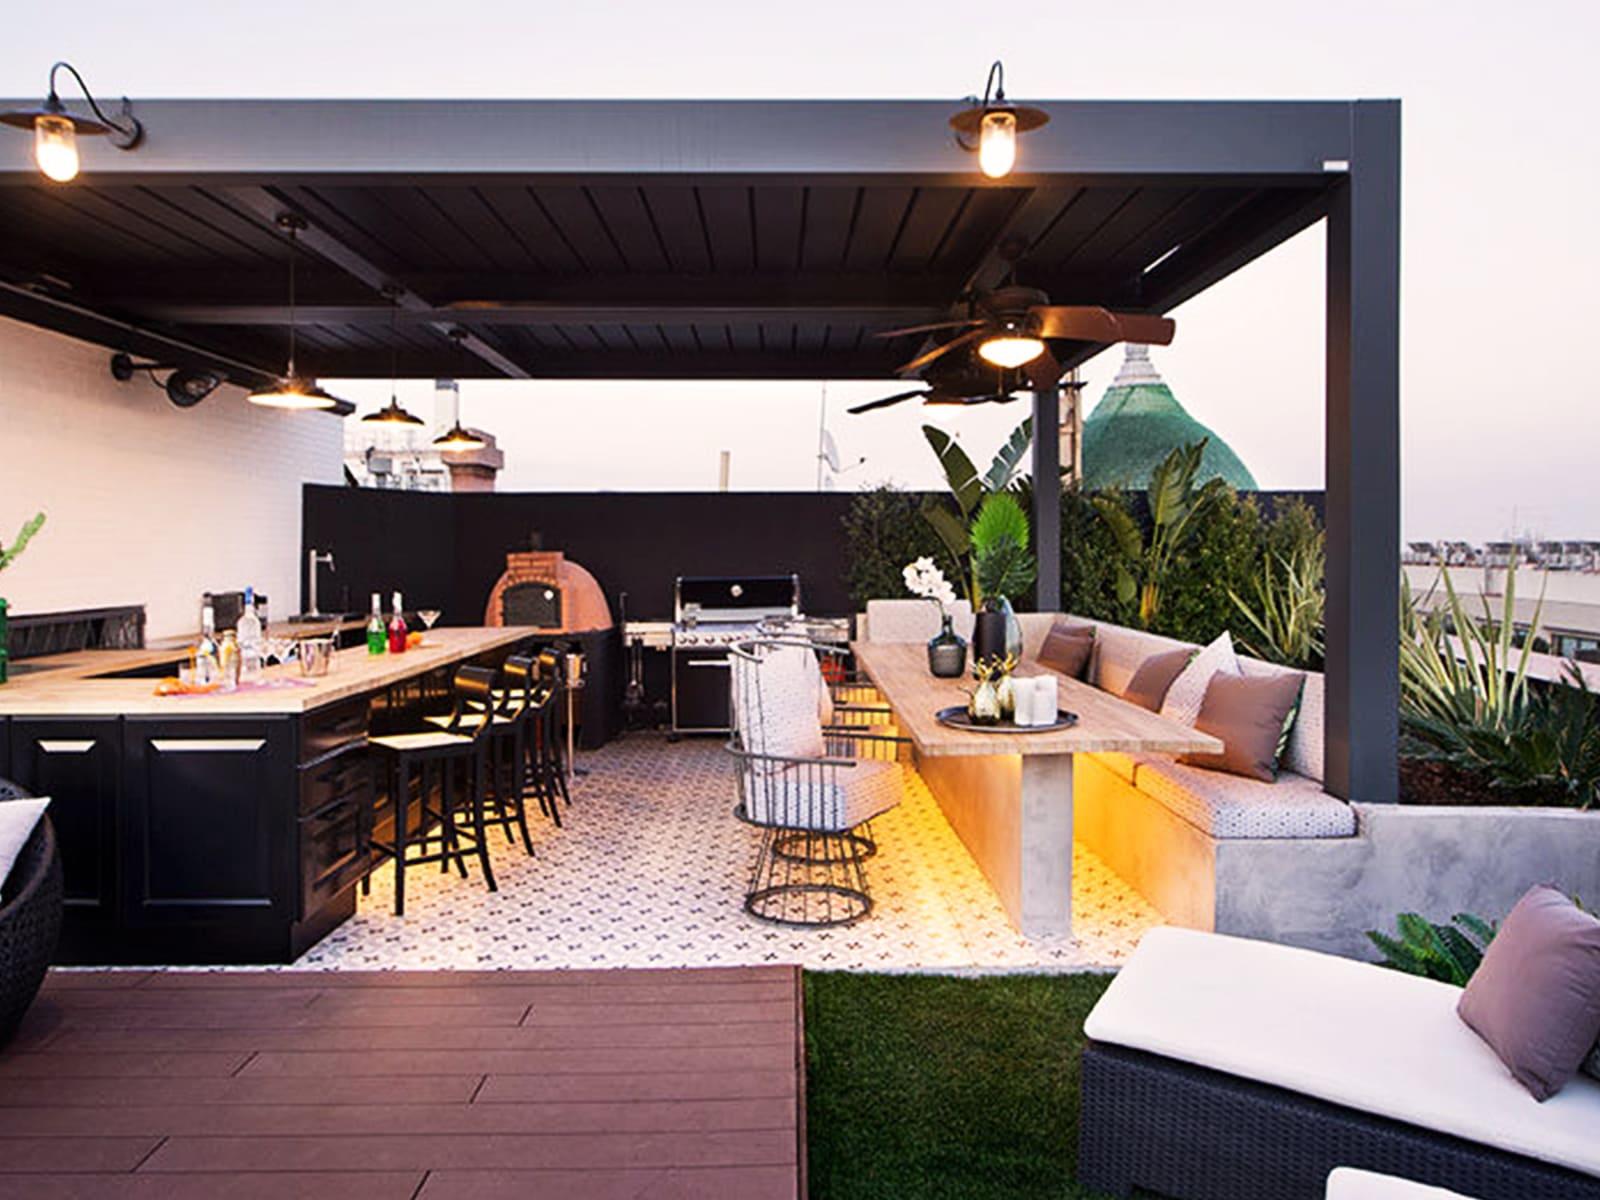 blog-vegetacion-decoracion-bares-restaurantes-12_HIDROJARDIN-Bañeres